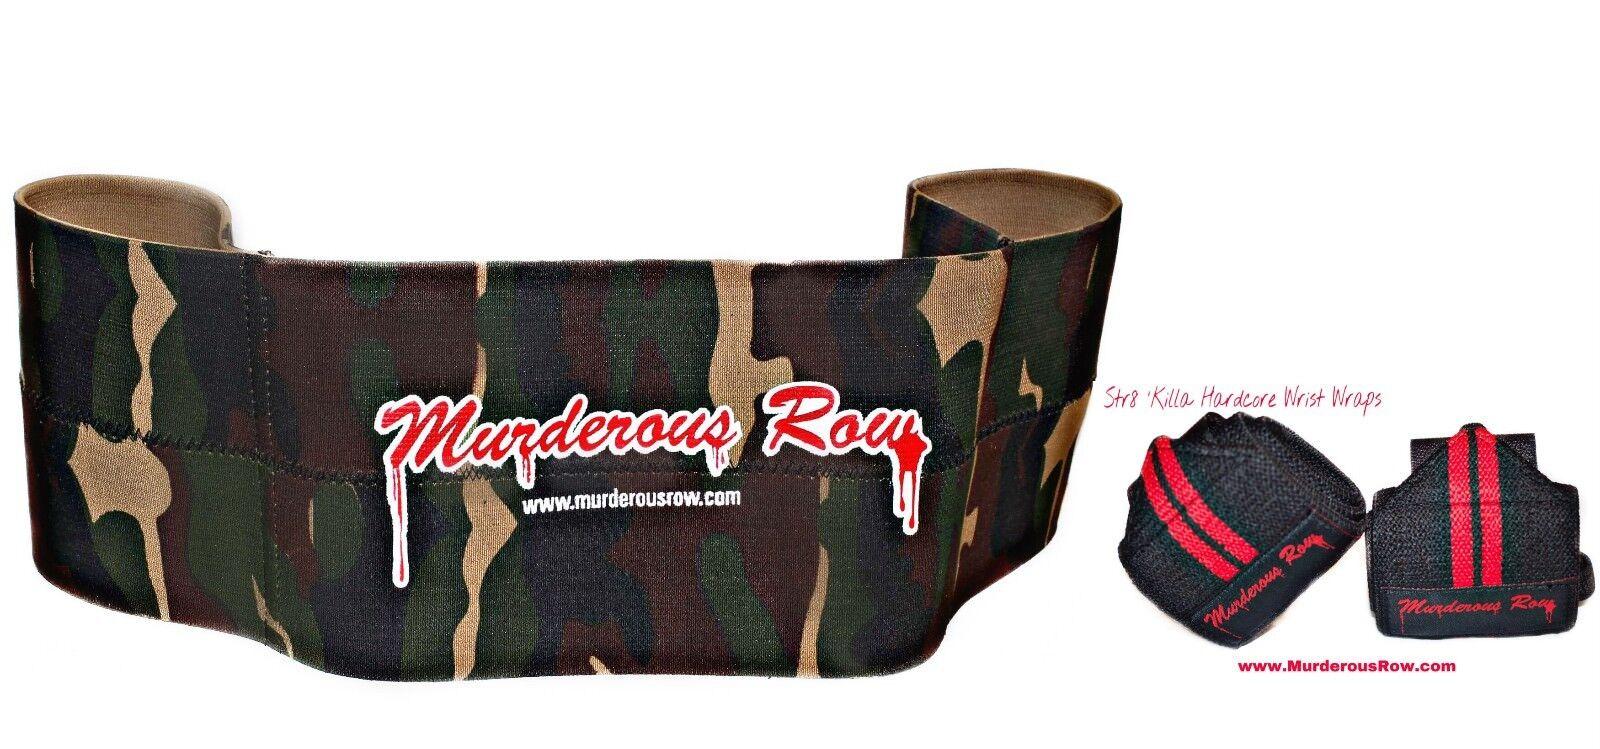 Murderous Row Bench Press  Sling Shot Desert Storm (XL) + STR8 'KILLA Wrist Wraps  store sale outlet